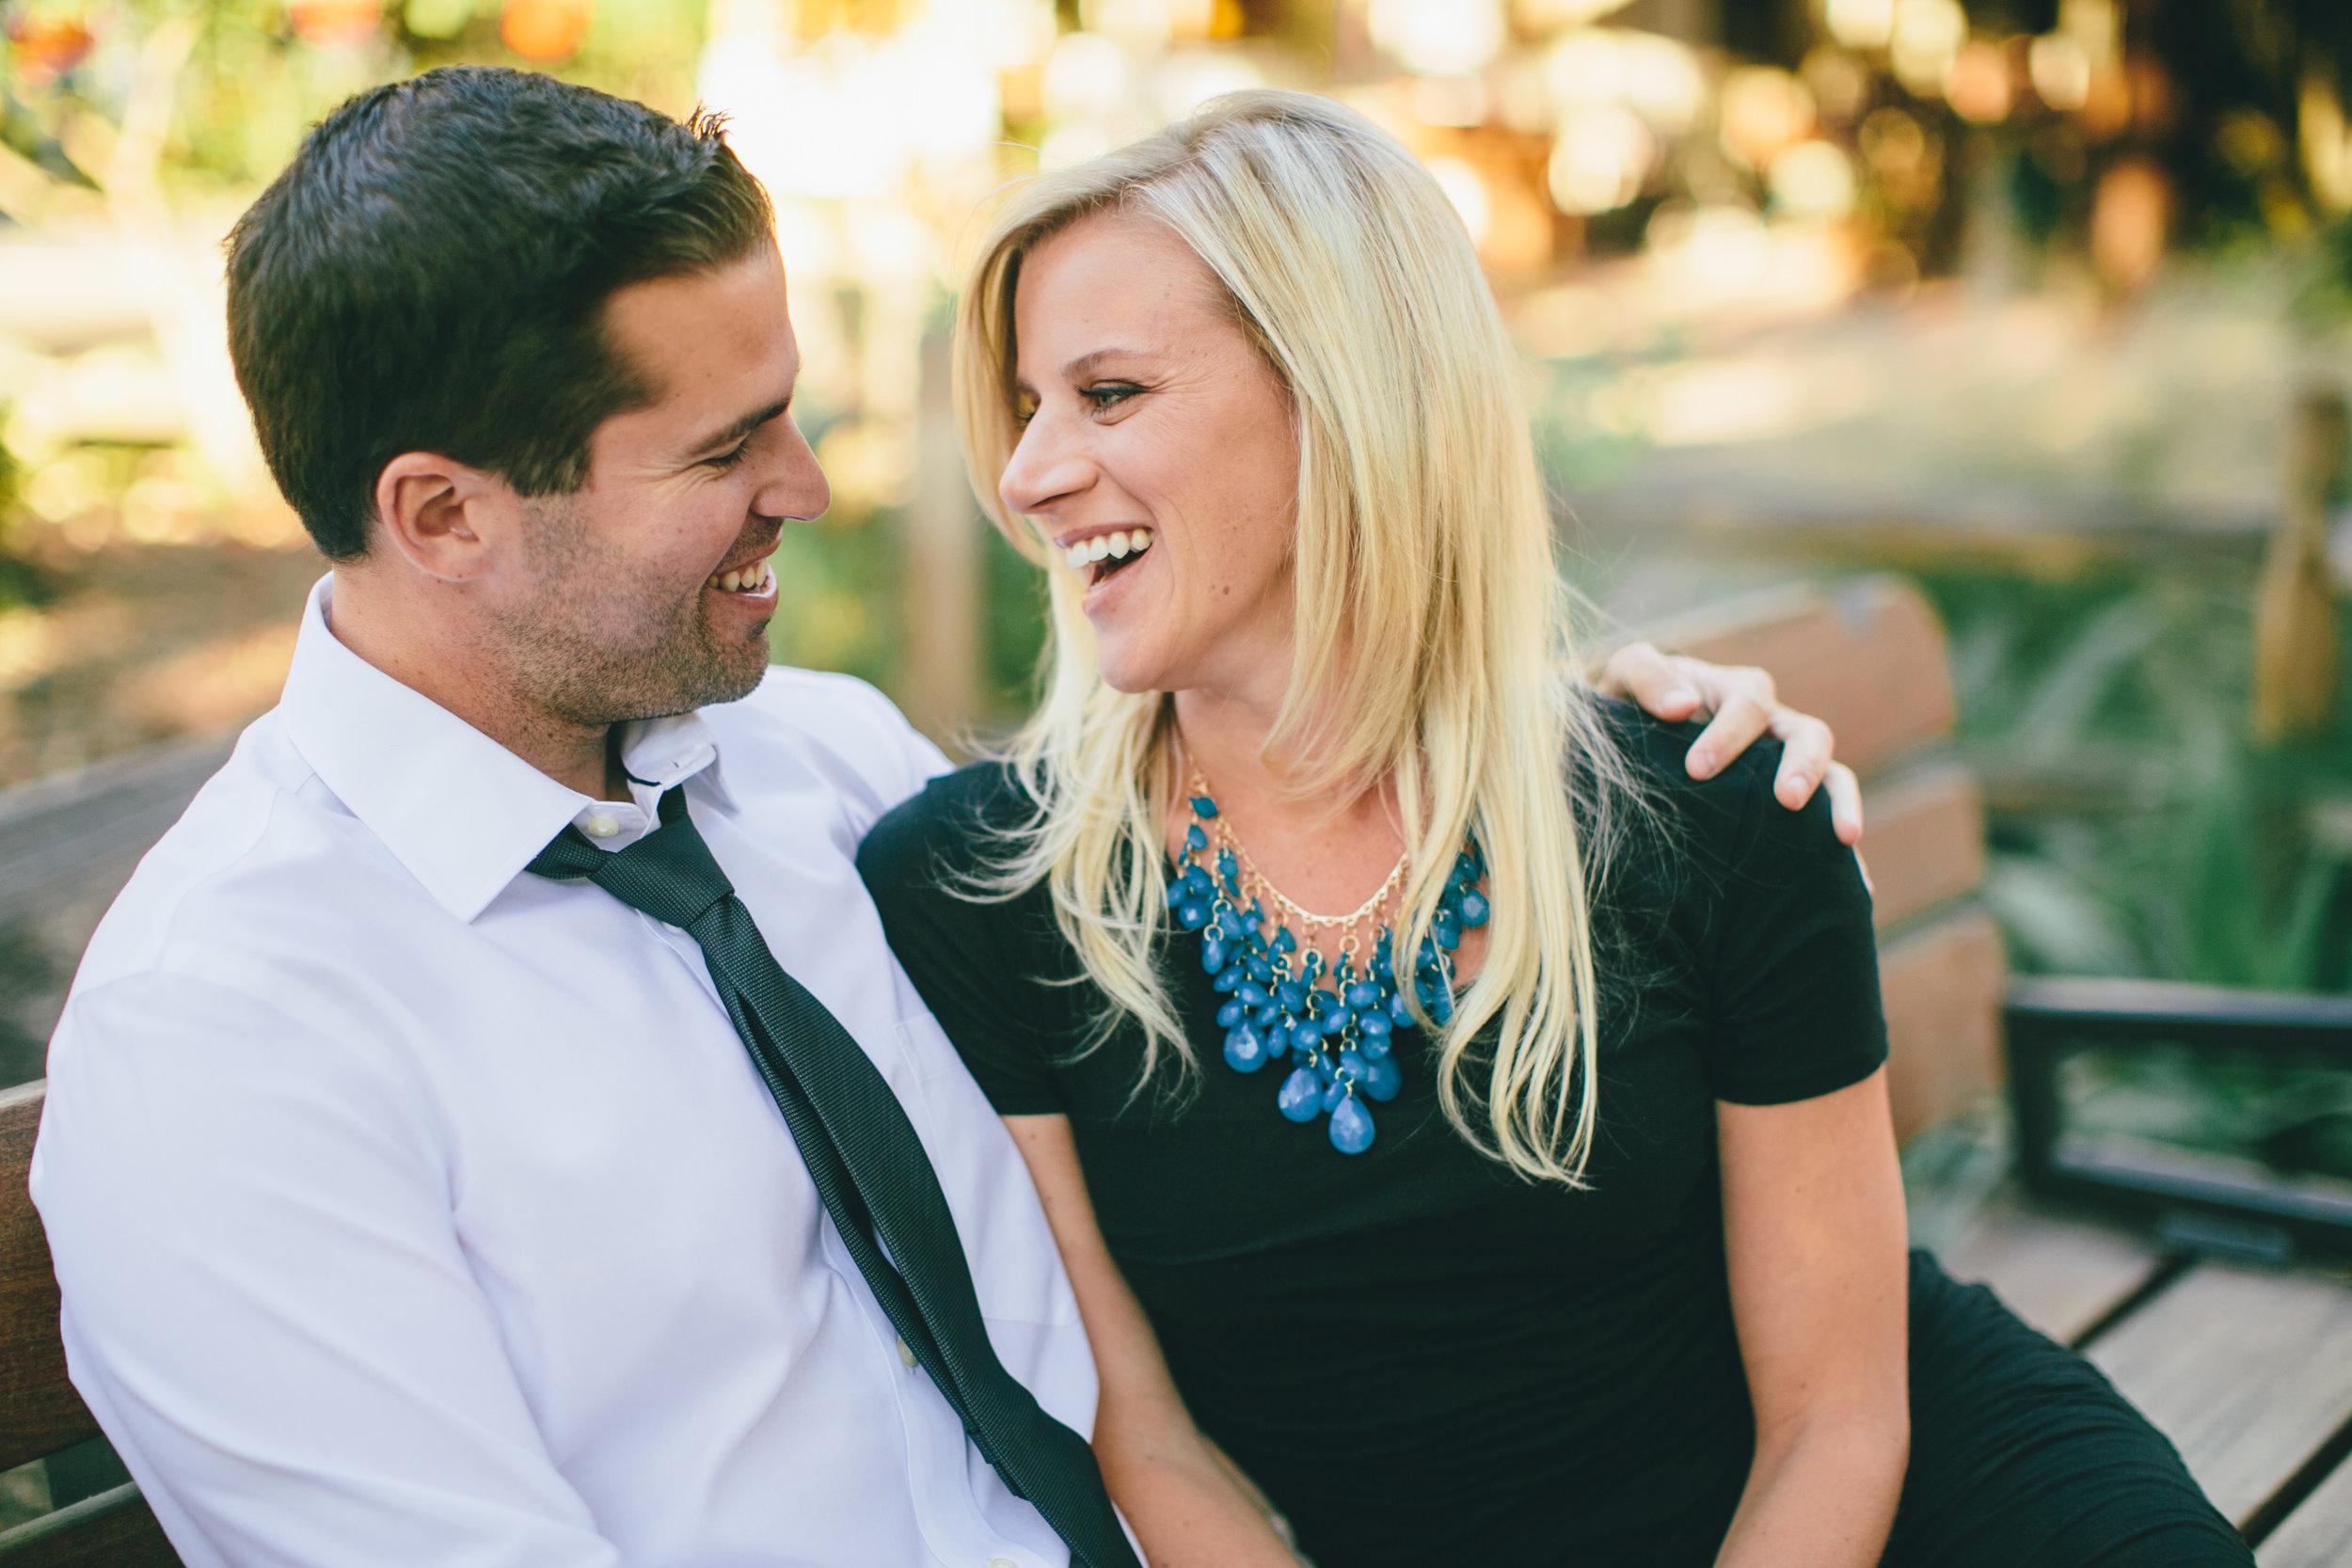 We enjoy laughing together...often!